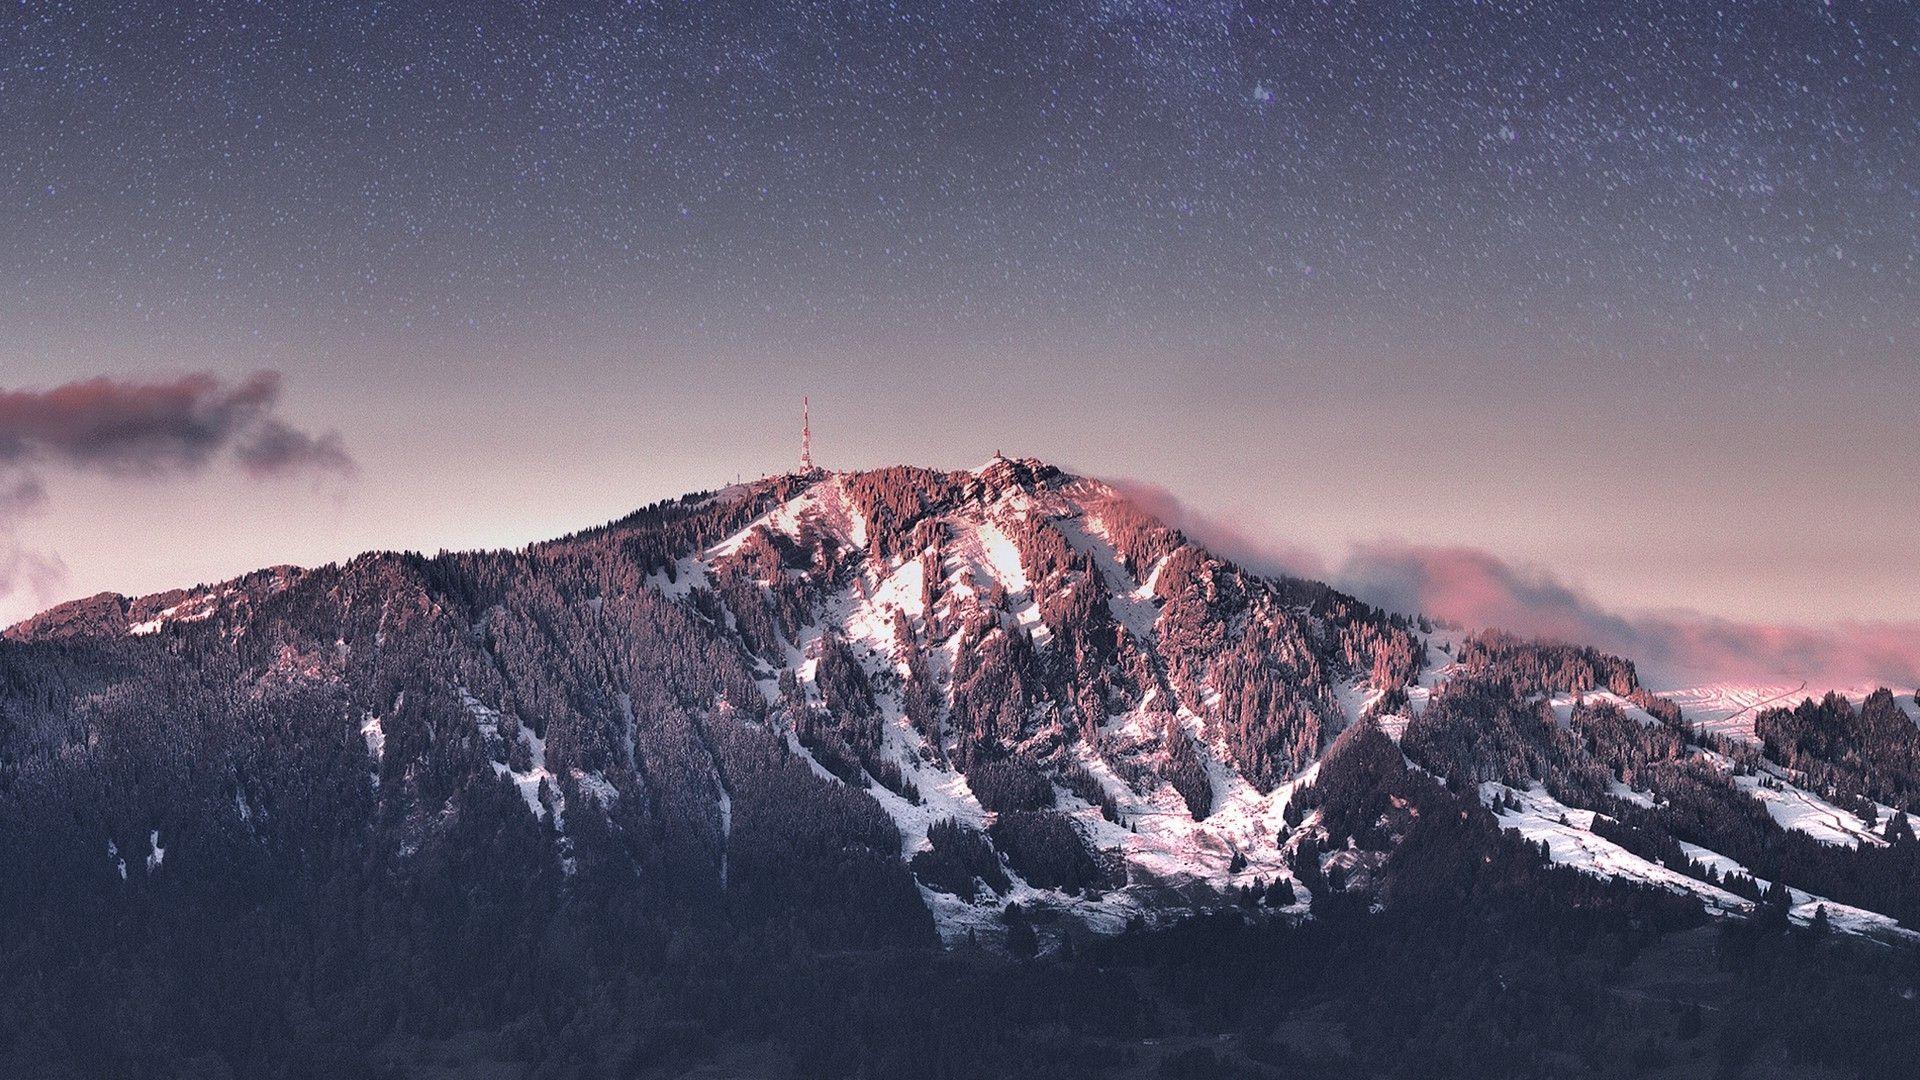 Pin By Marcos Portal On Pics Mountain Wallpaper Wallpaper Landscape Wallpaper 1080p